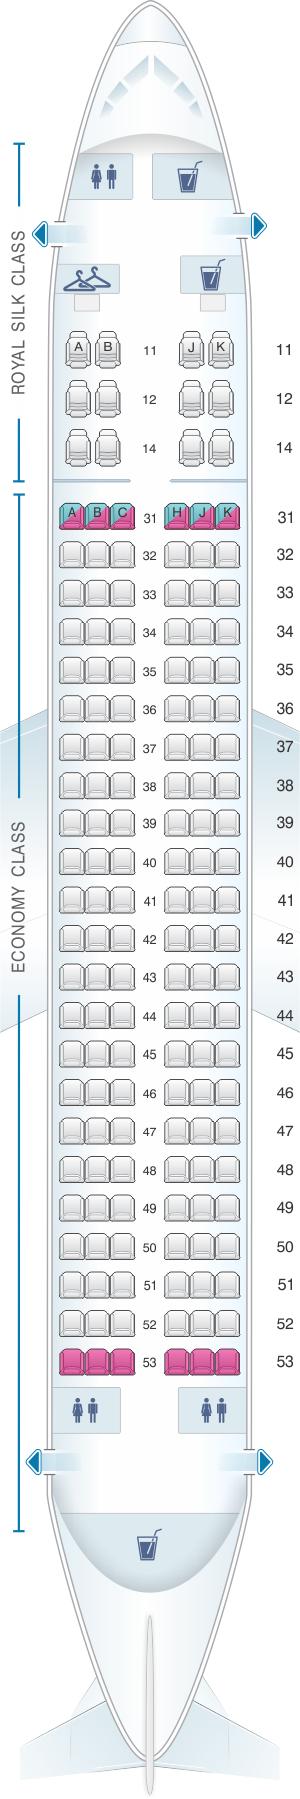 Seat map for Thai Airways International Boeing B737 400